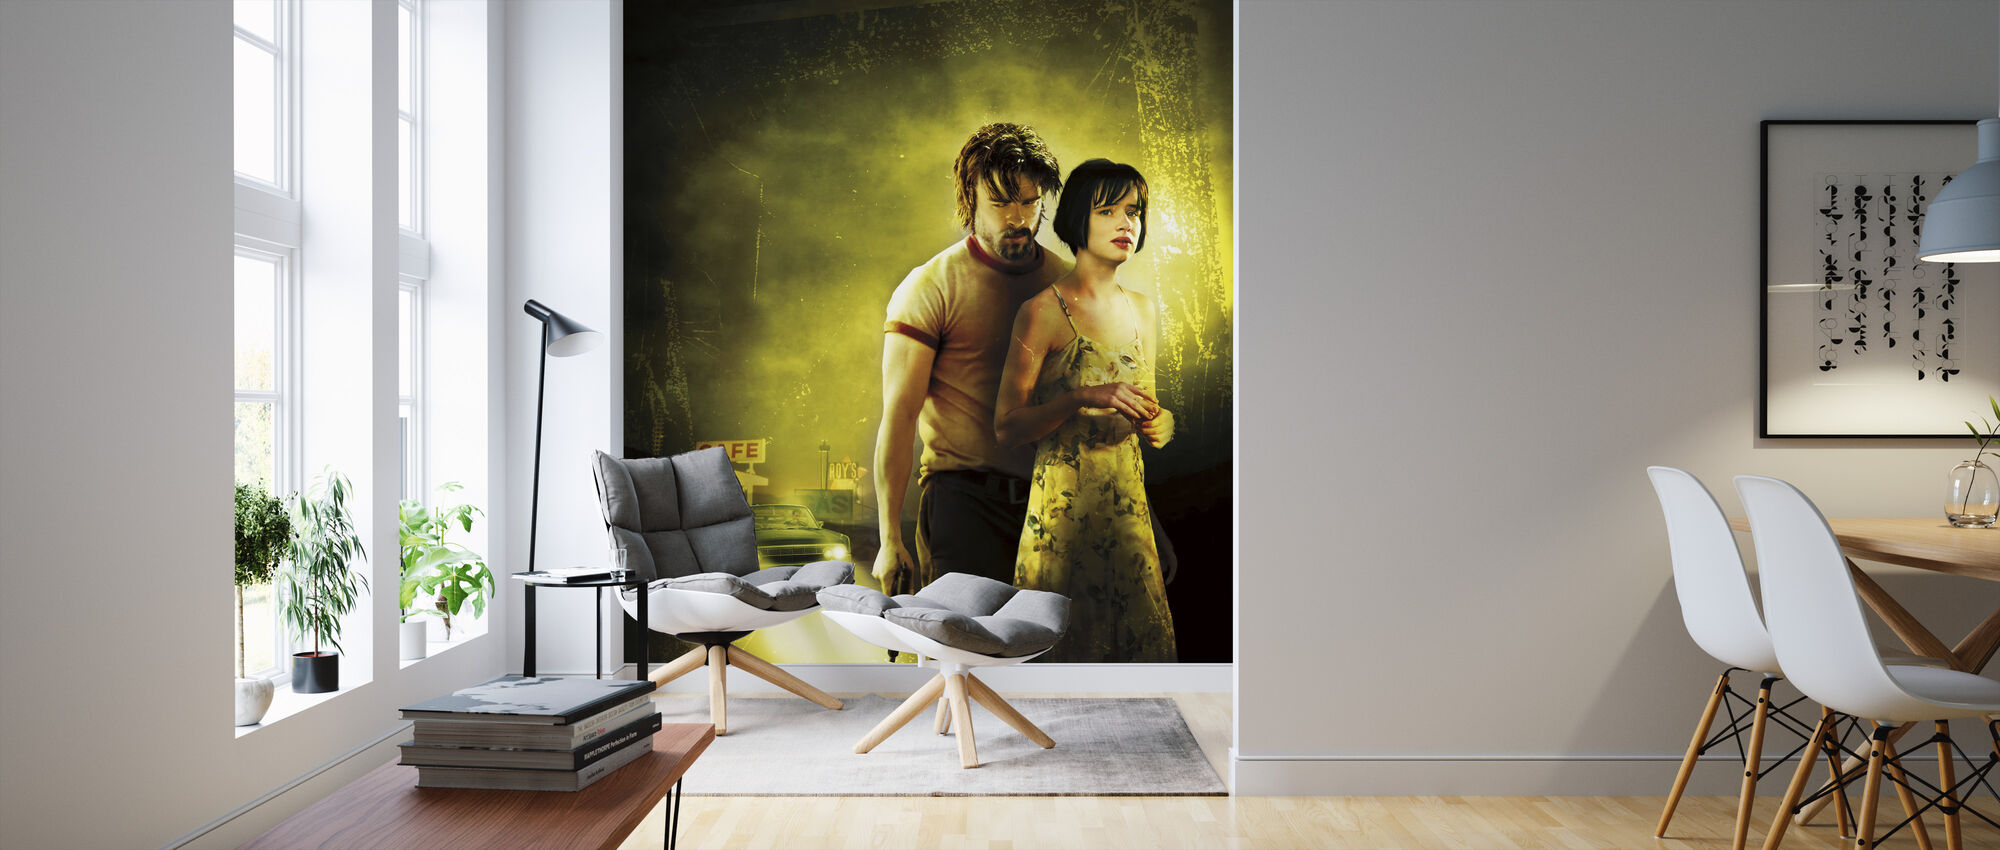 Juliette Lewis and Brad Pitt in Kalifornia - Wallpaper - Living Room